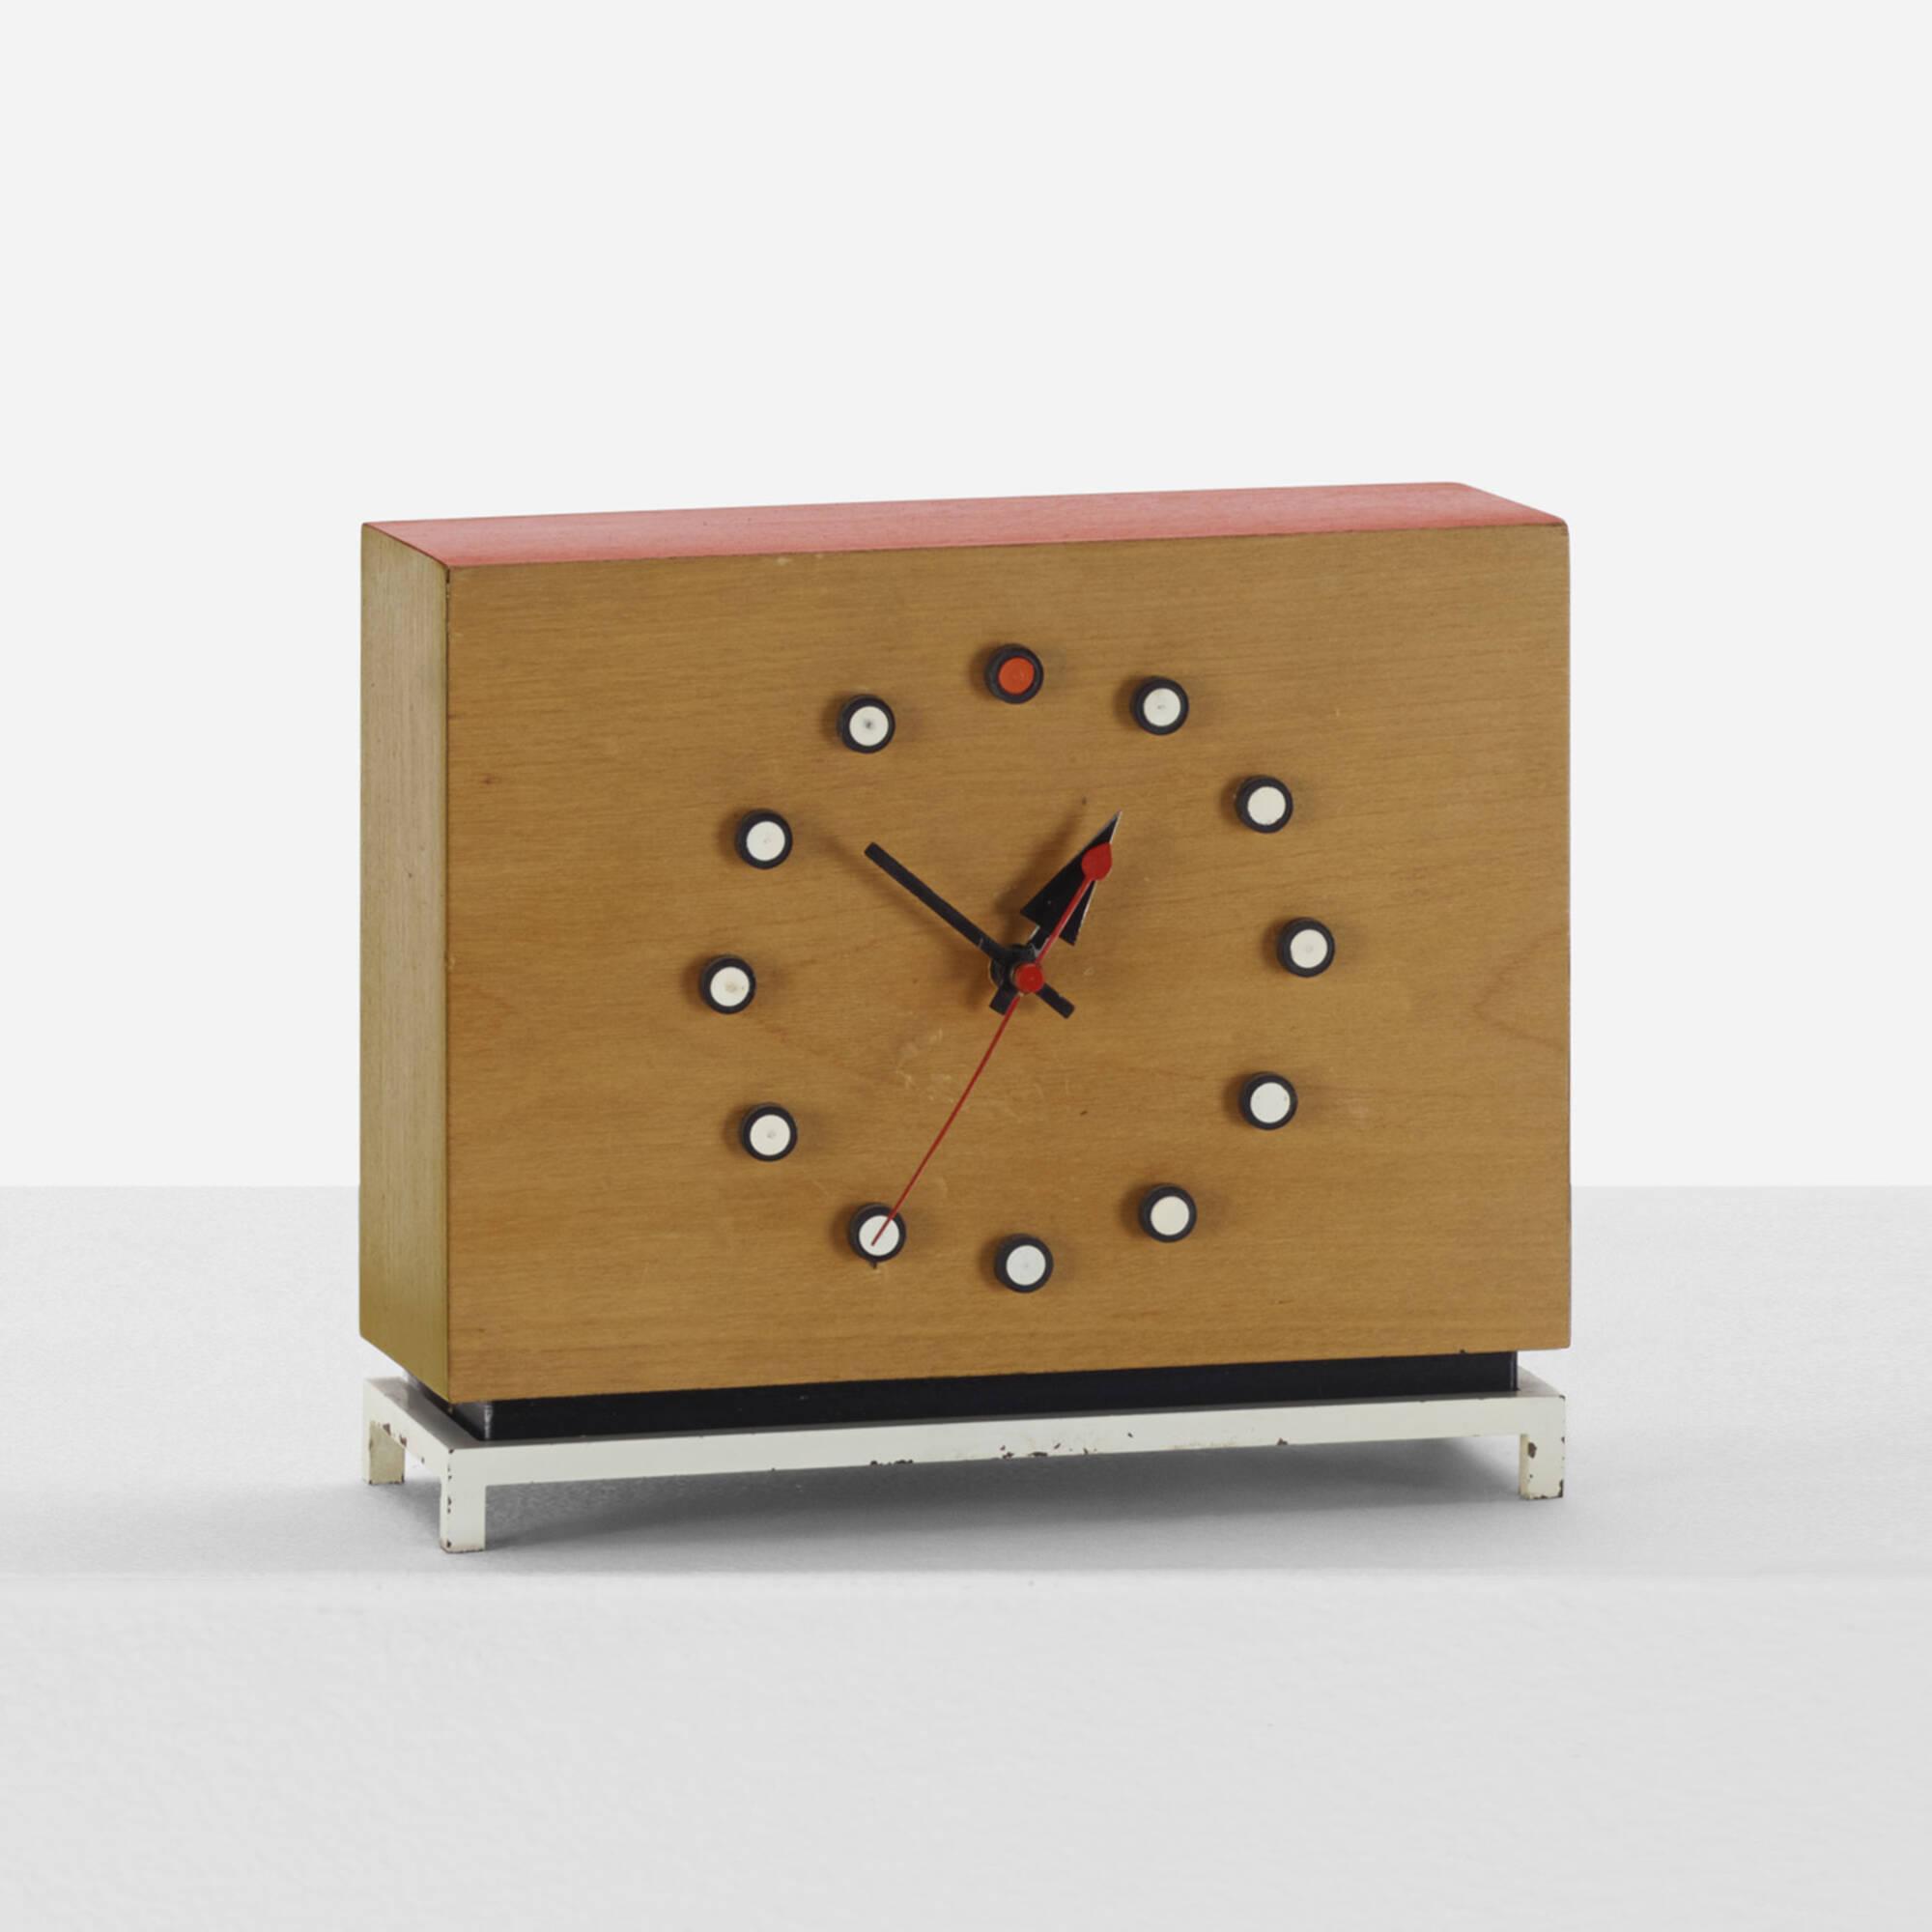 Marvelous 341: George Nelson U0026 Associates / Table Clock, Model 4761 (1 Of 2